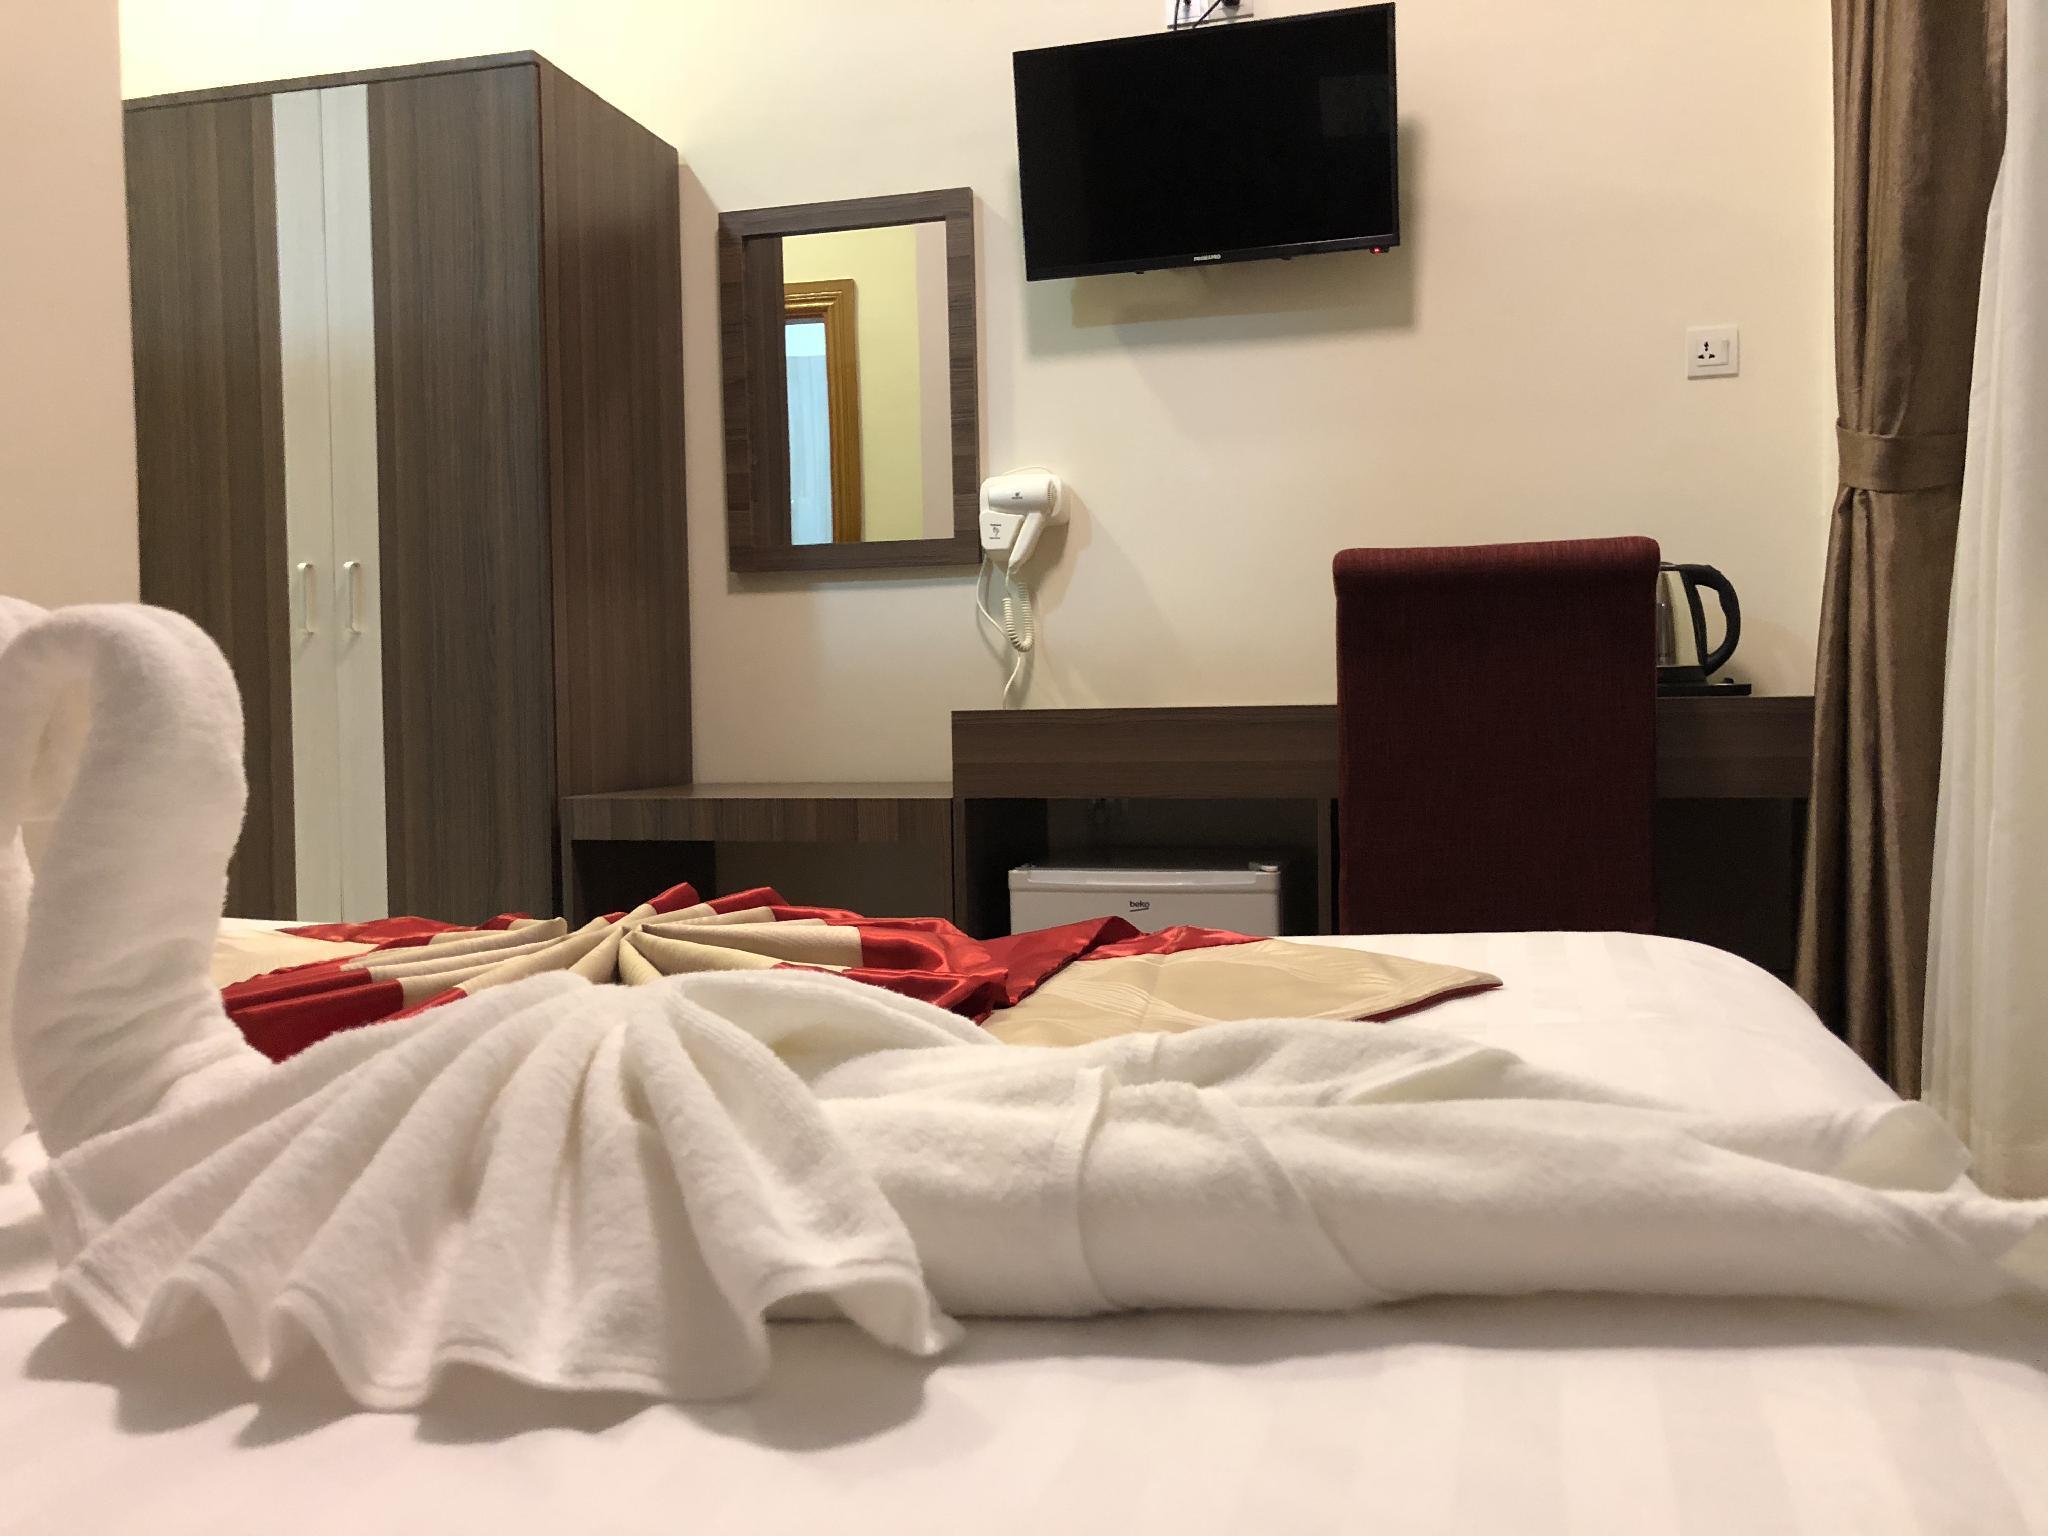 Hotel KS (Mawlamyaine), Mawlamyine